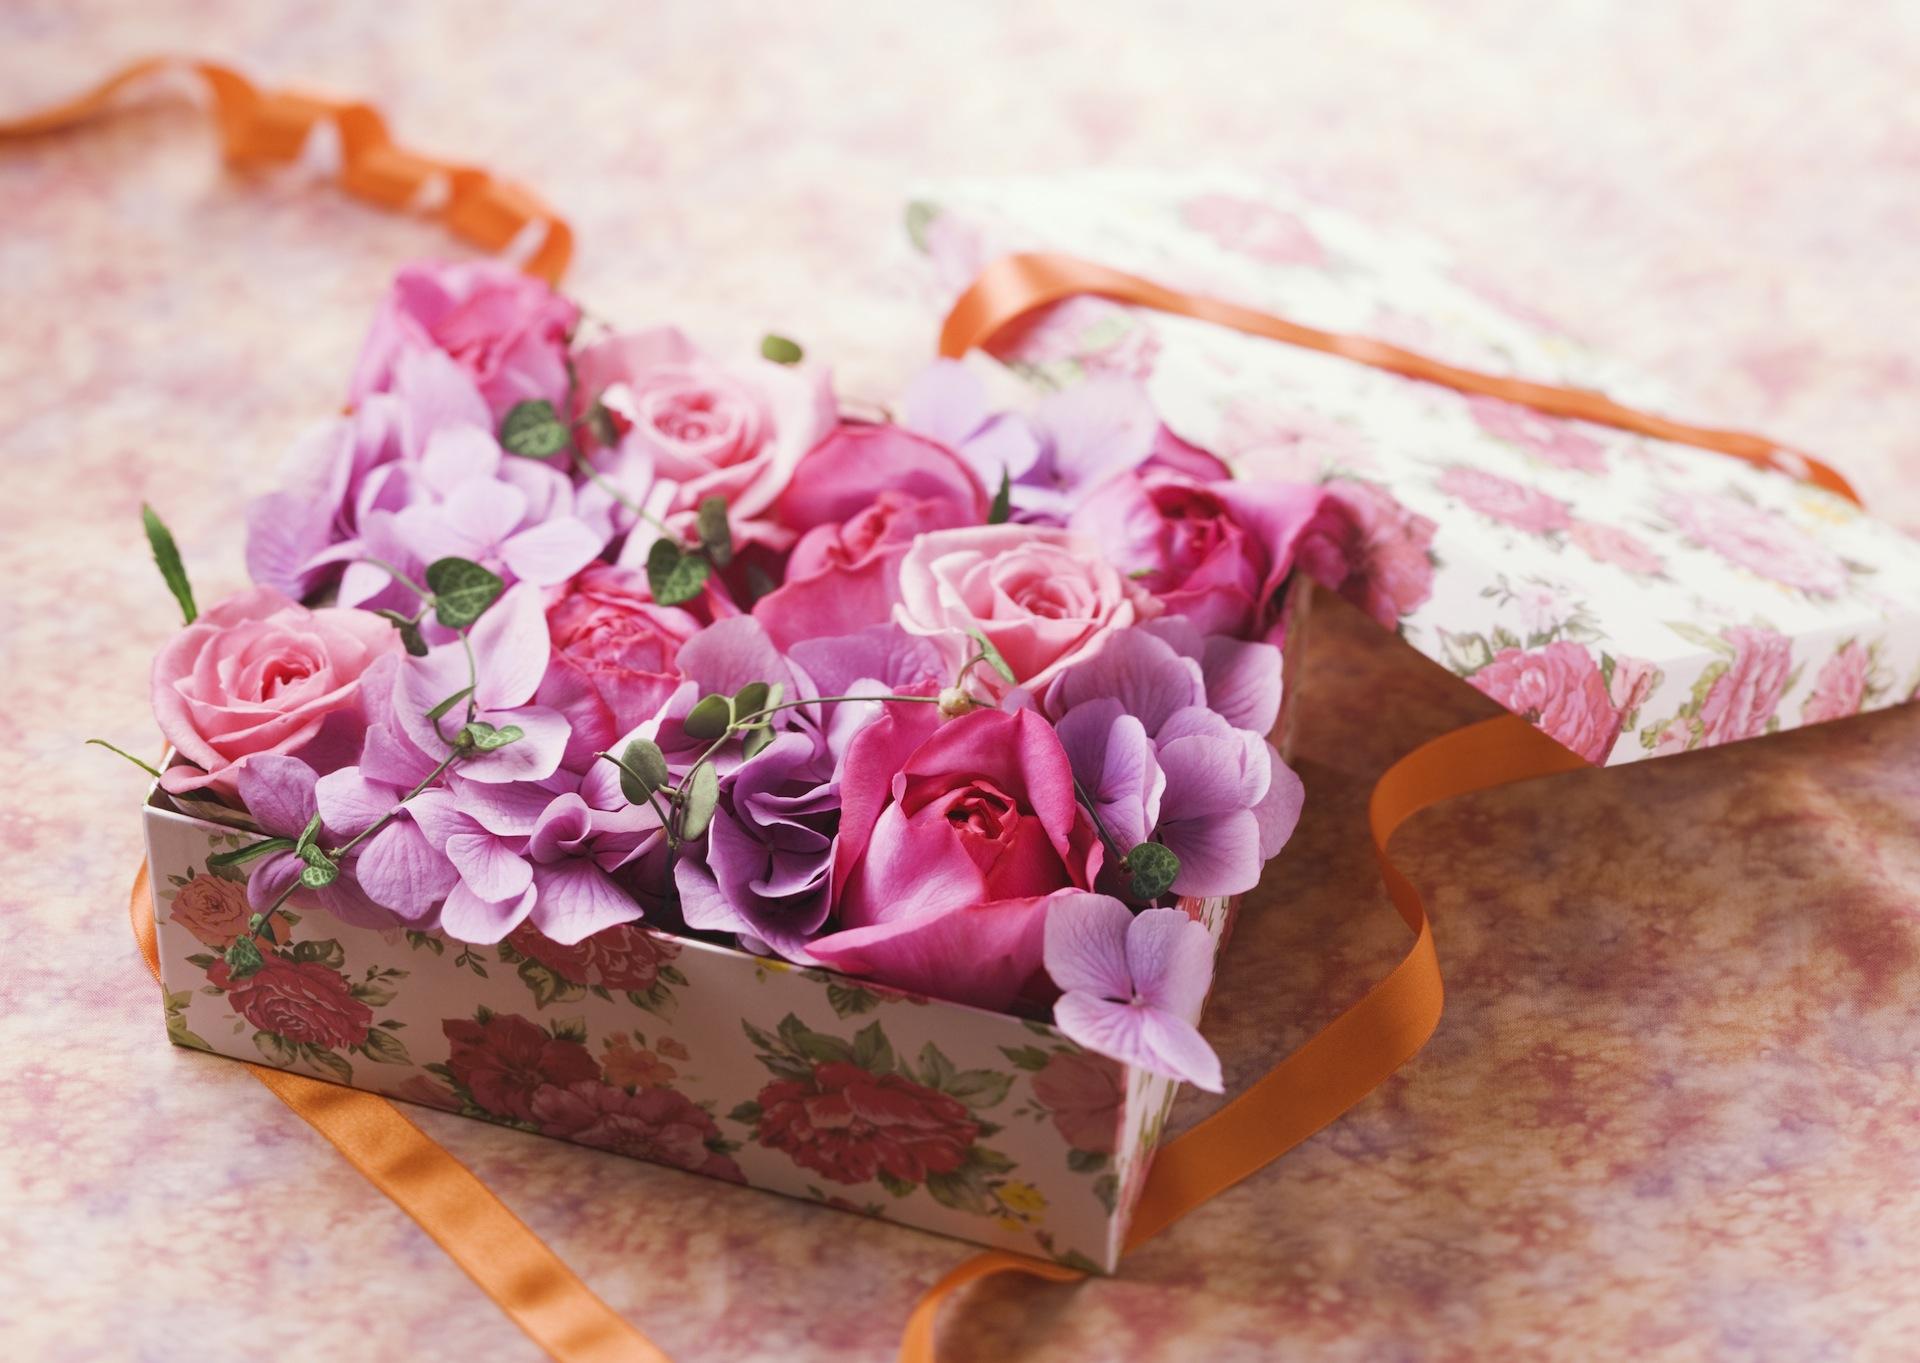 Nice Flowers Gift - Nice Flowers Gift